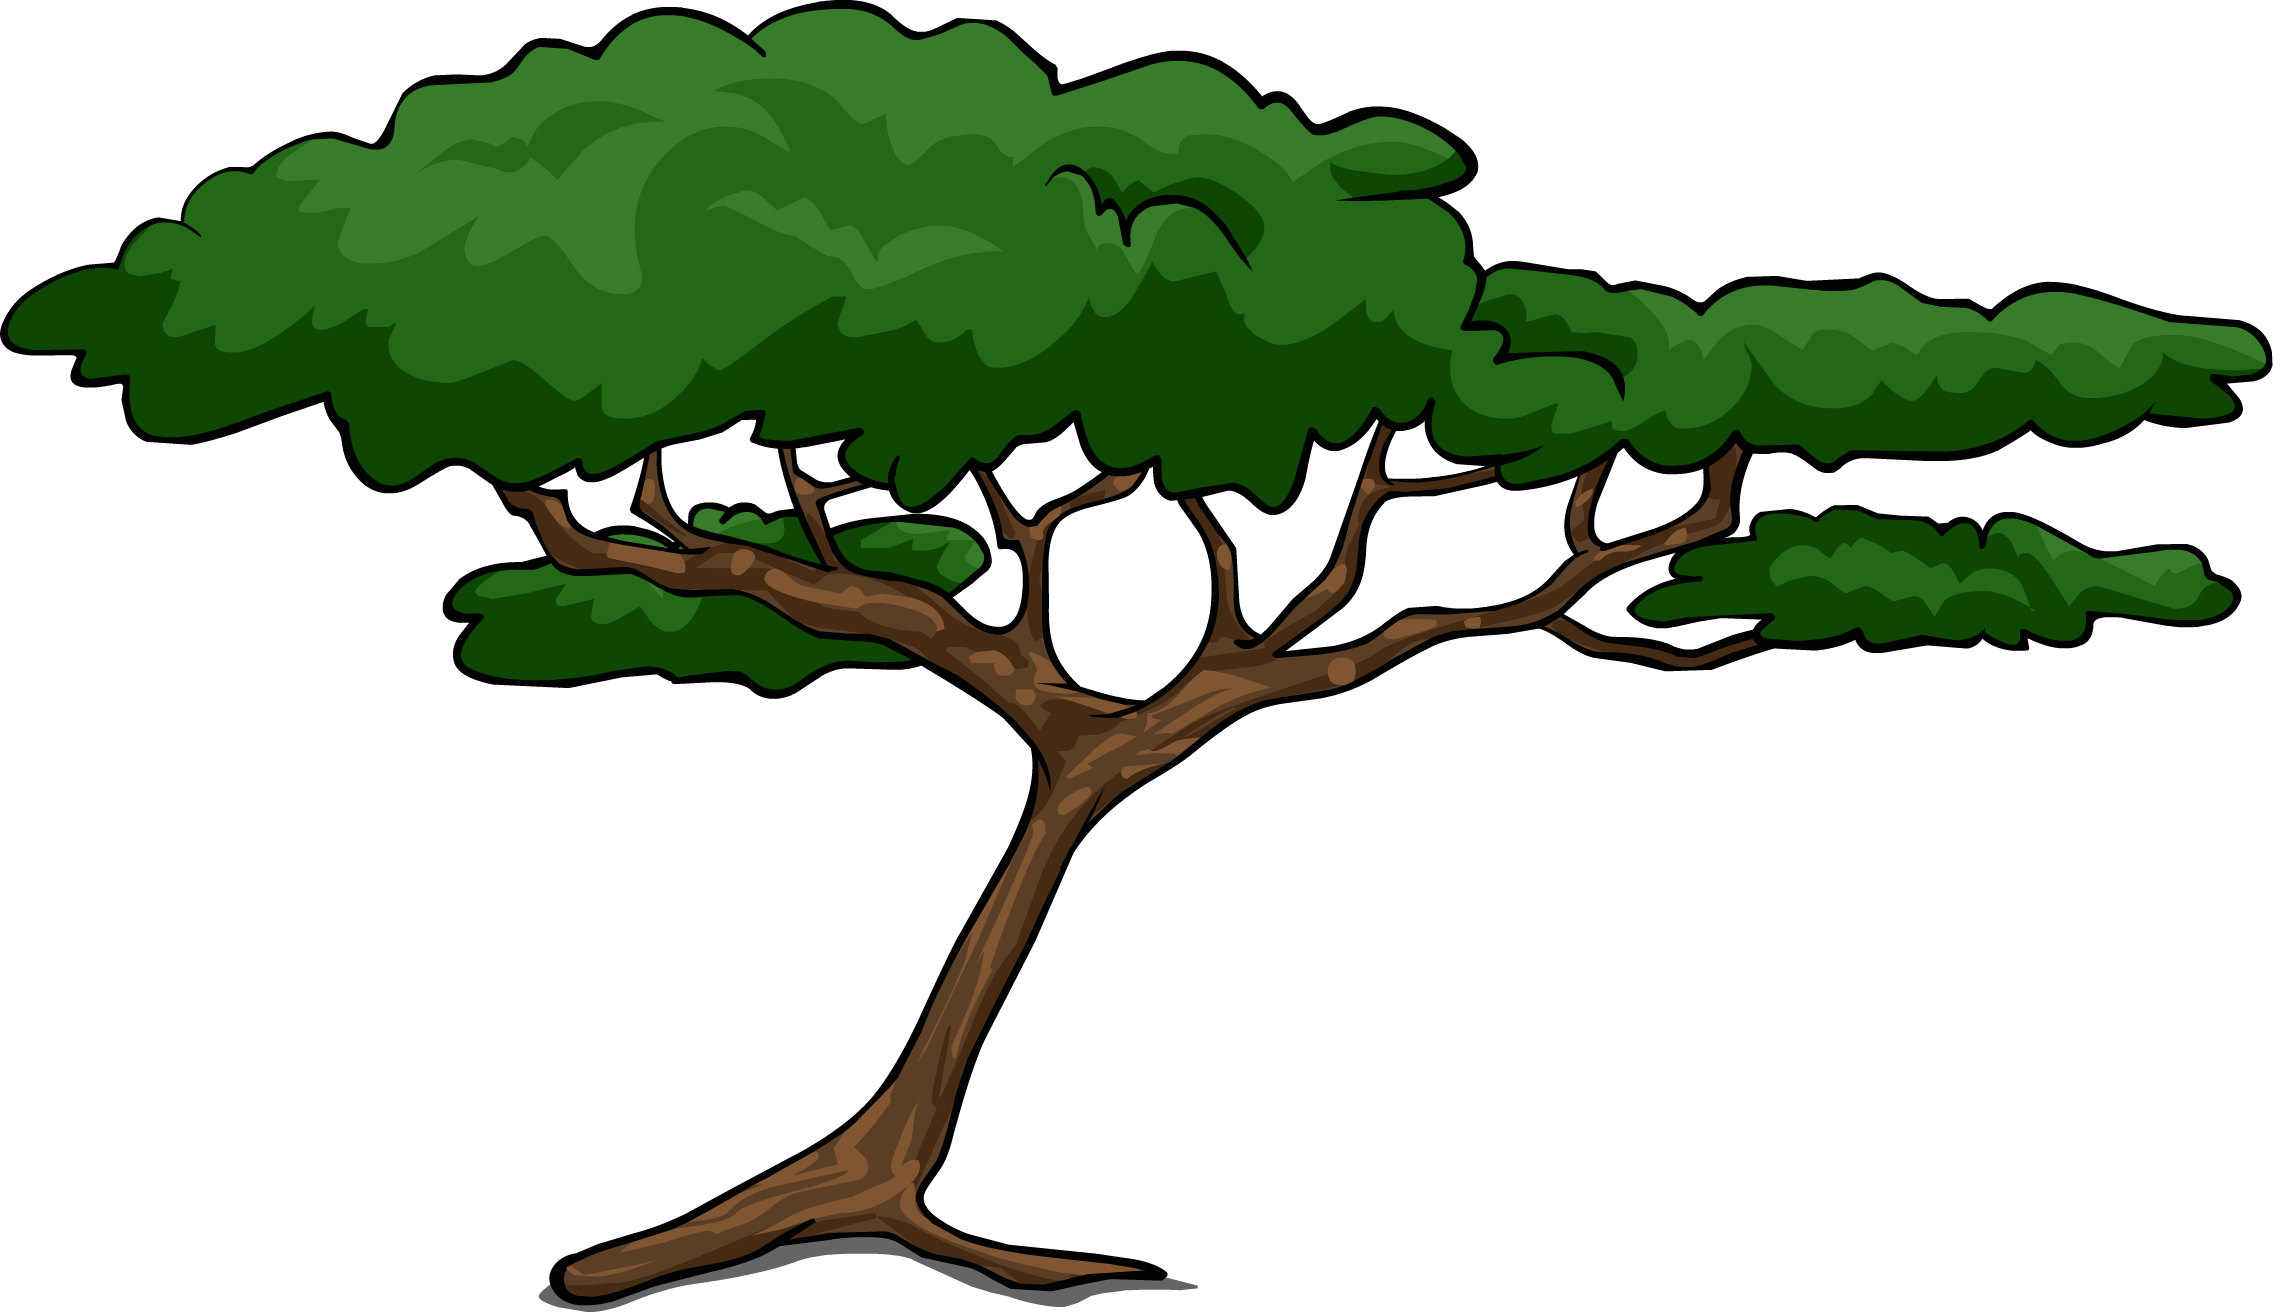 Realistic clipart acacia tree #4